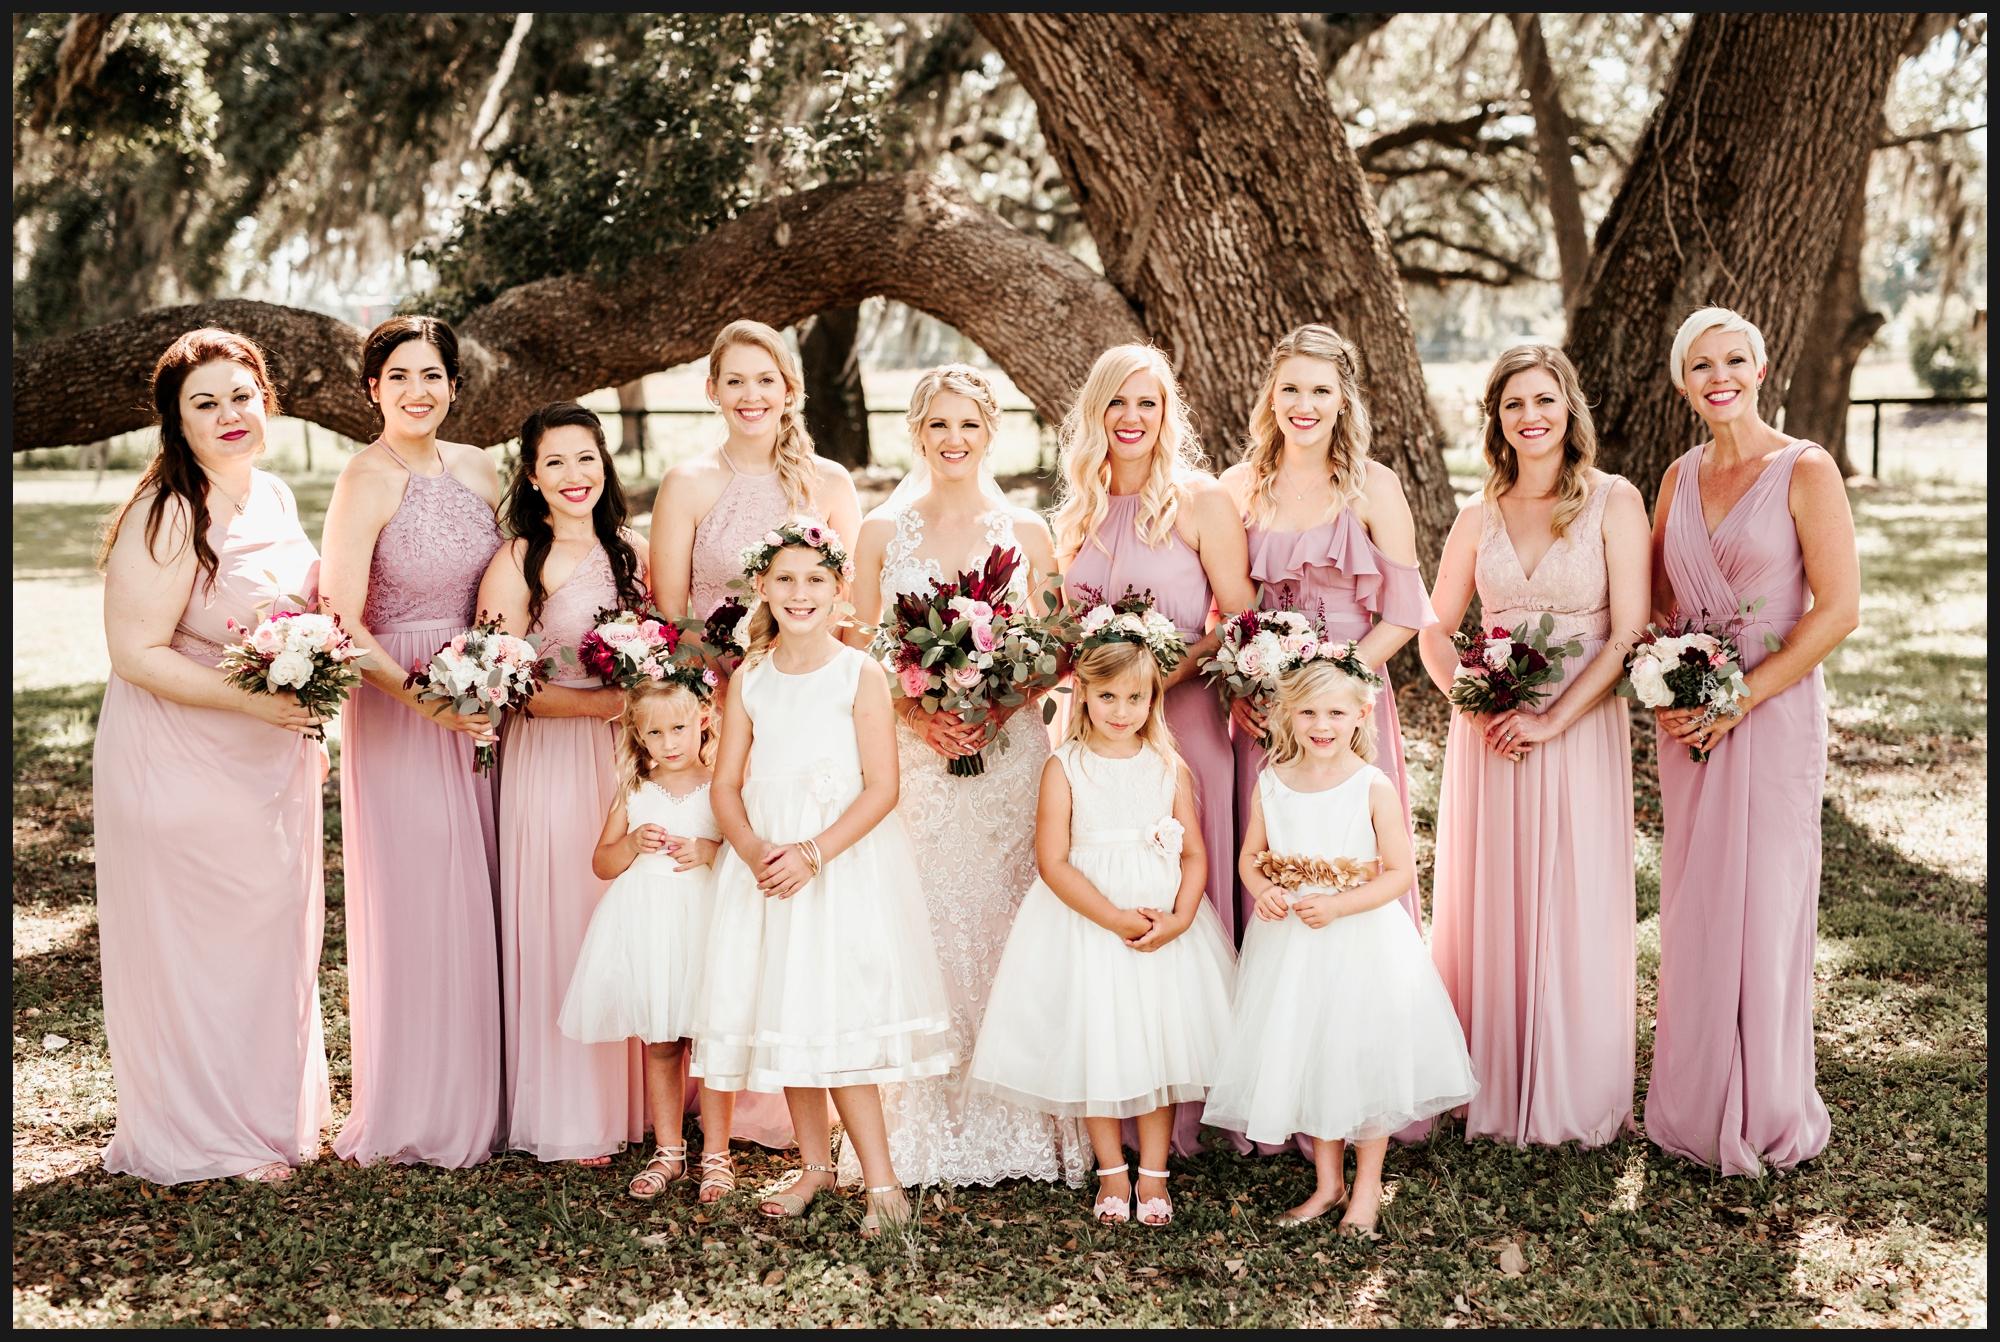 Orlando-Wedding-Photographer-destination-wedding-photographer-florida-wedding-photographer-hawaii-wedding-photographer_0581.jpg